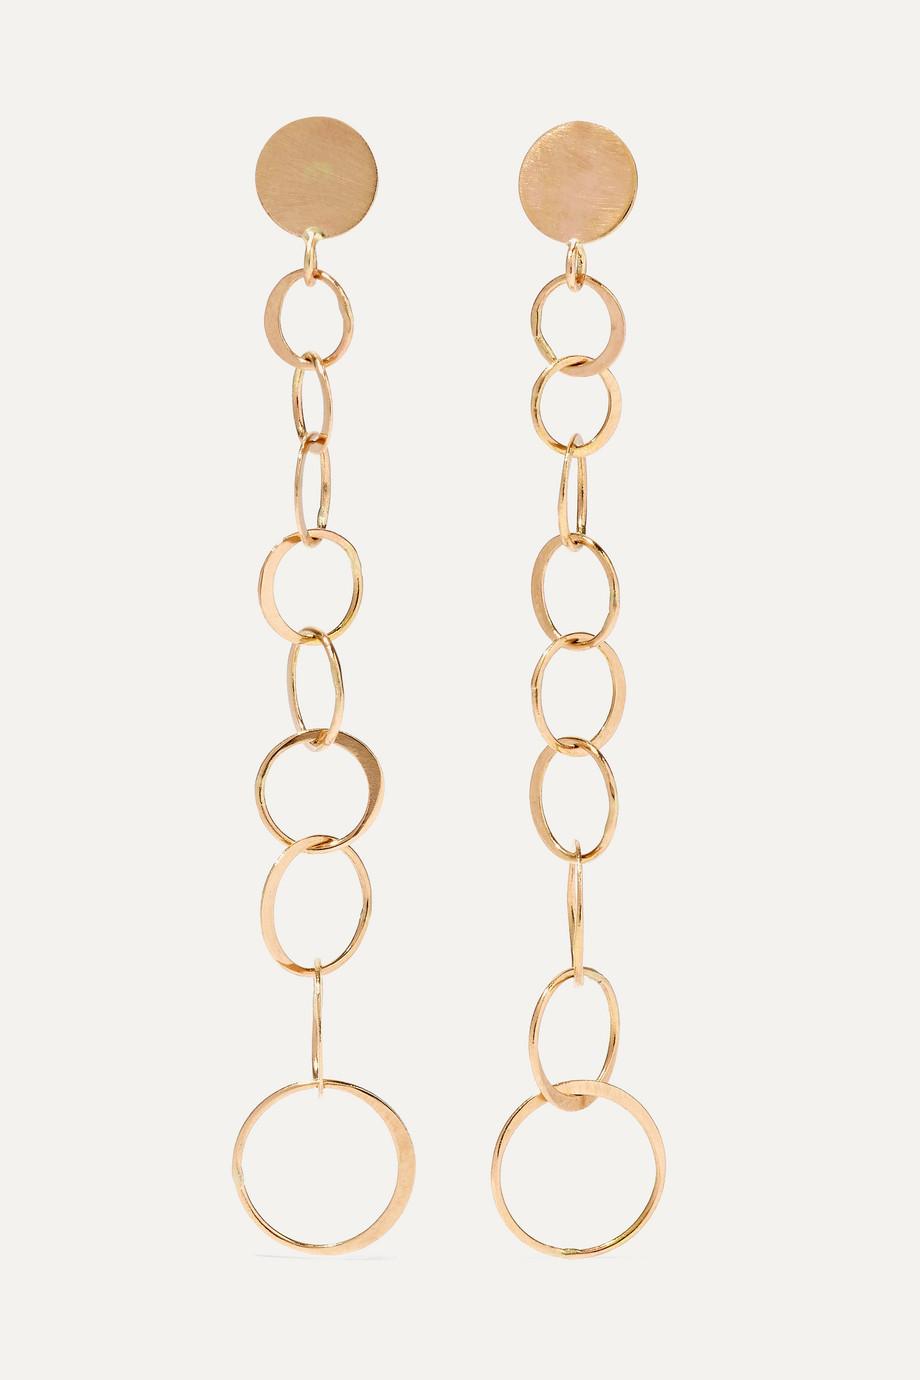 Melissa Joy Manning + NET SUSTAIN Gradient Circle 14-karat gold earrings